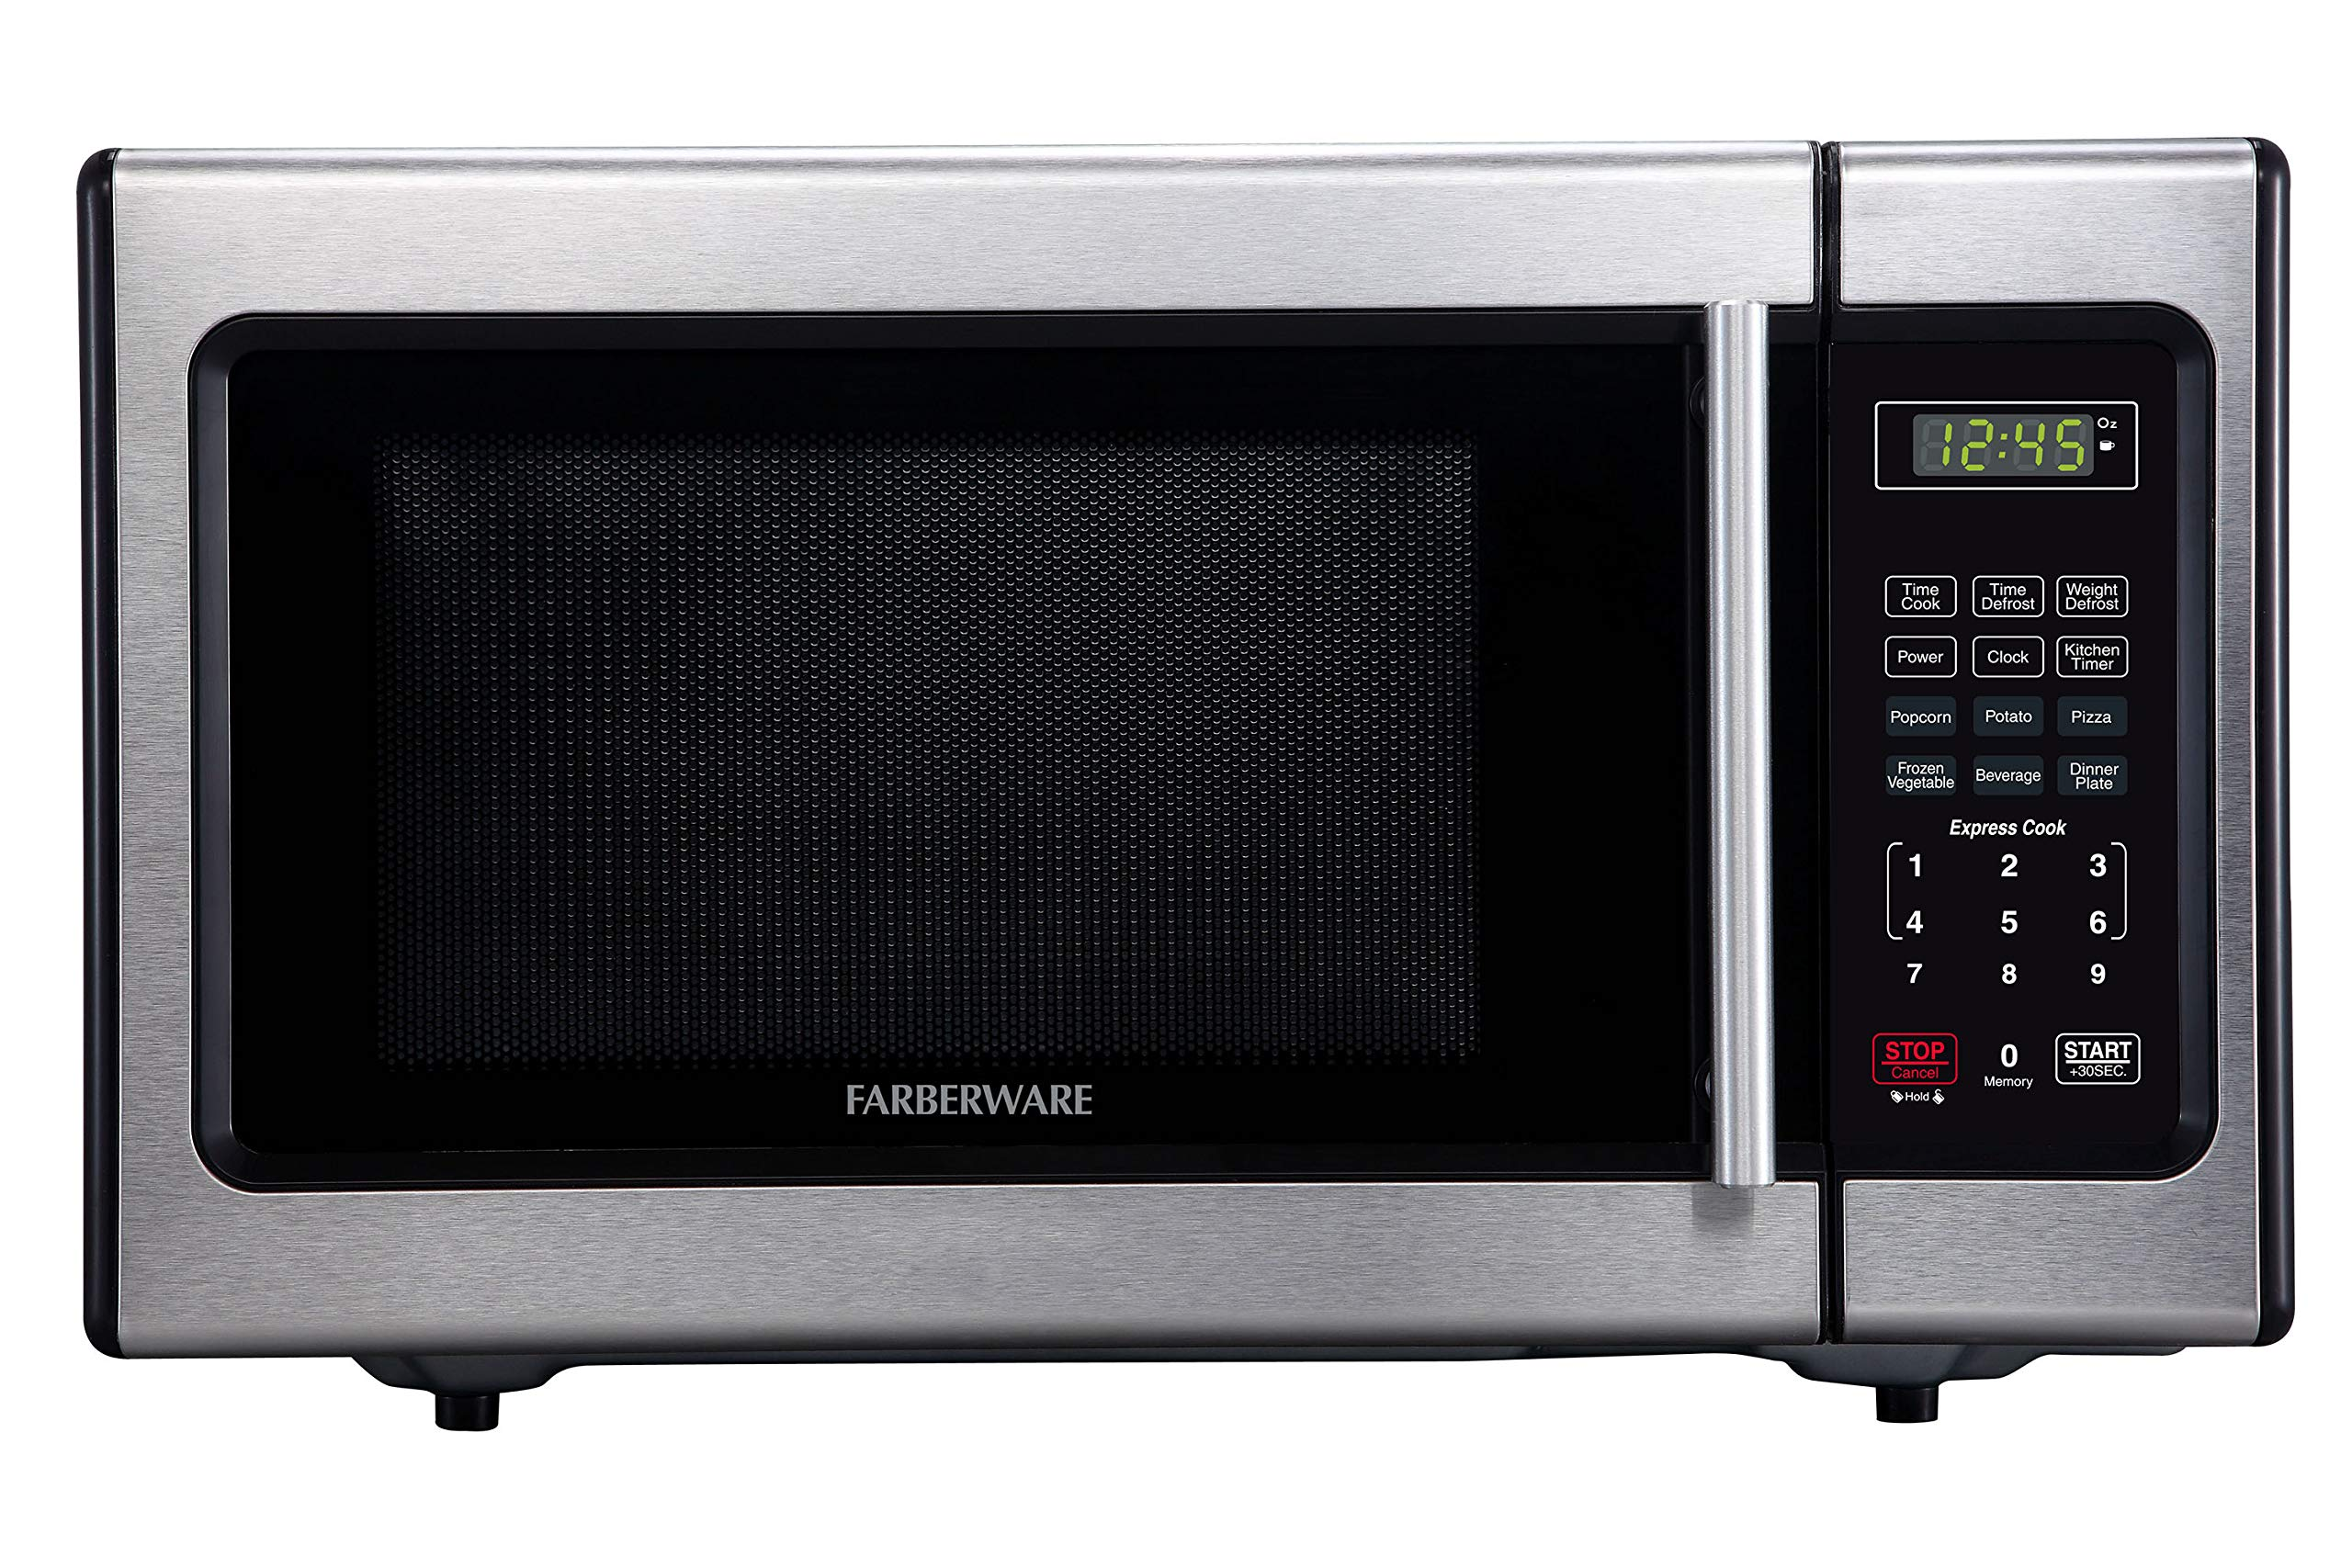 Farberware FMO09AHTBKD Classic 0.9 Cu. Ft. 900-Watt Microwave Oven